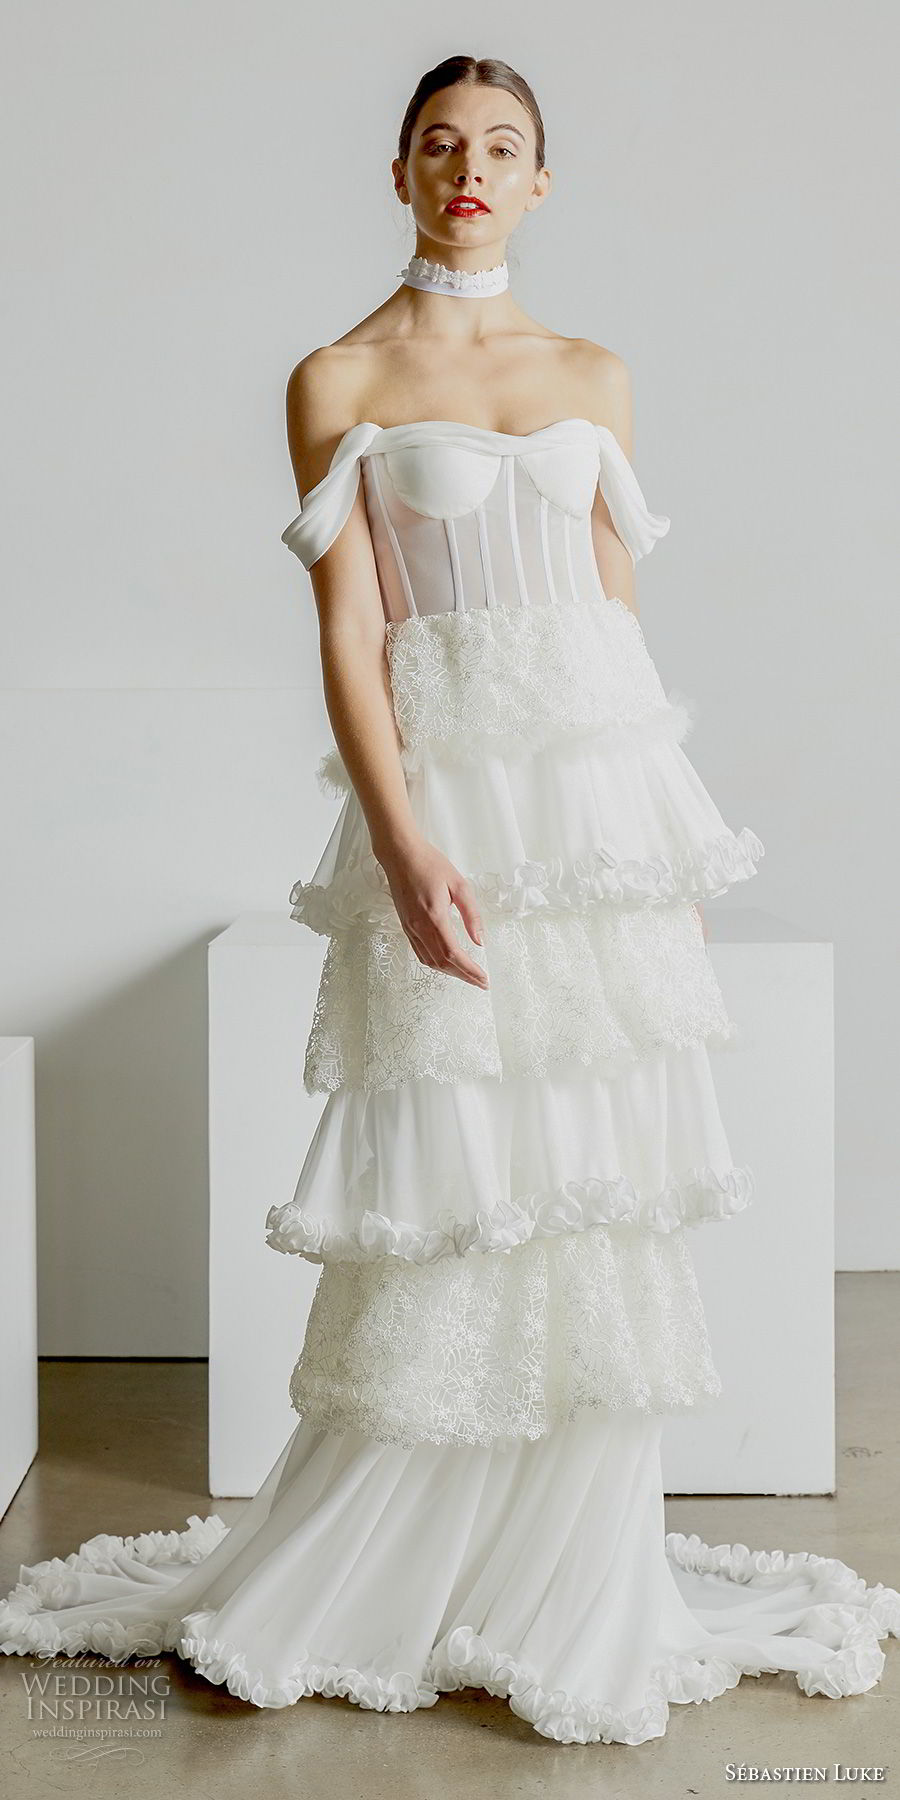 sebastien luke spring 2019 bridal off the shoulder sweetheart neckline bustier bodice simple tiered skirt romantic modified a line wedding dress short train (1) mv